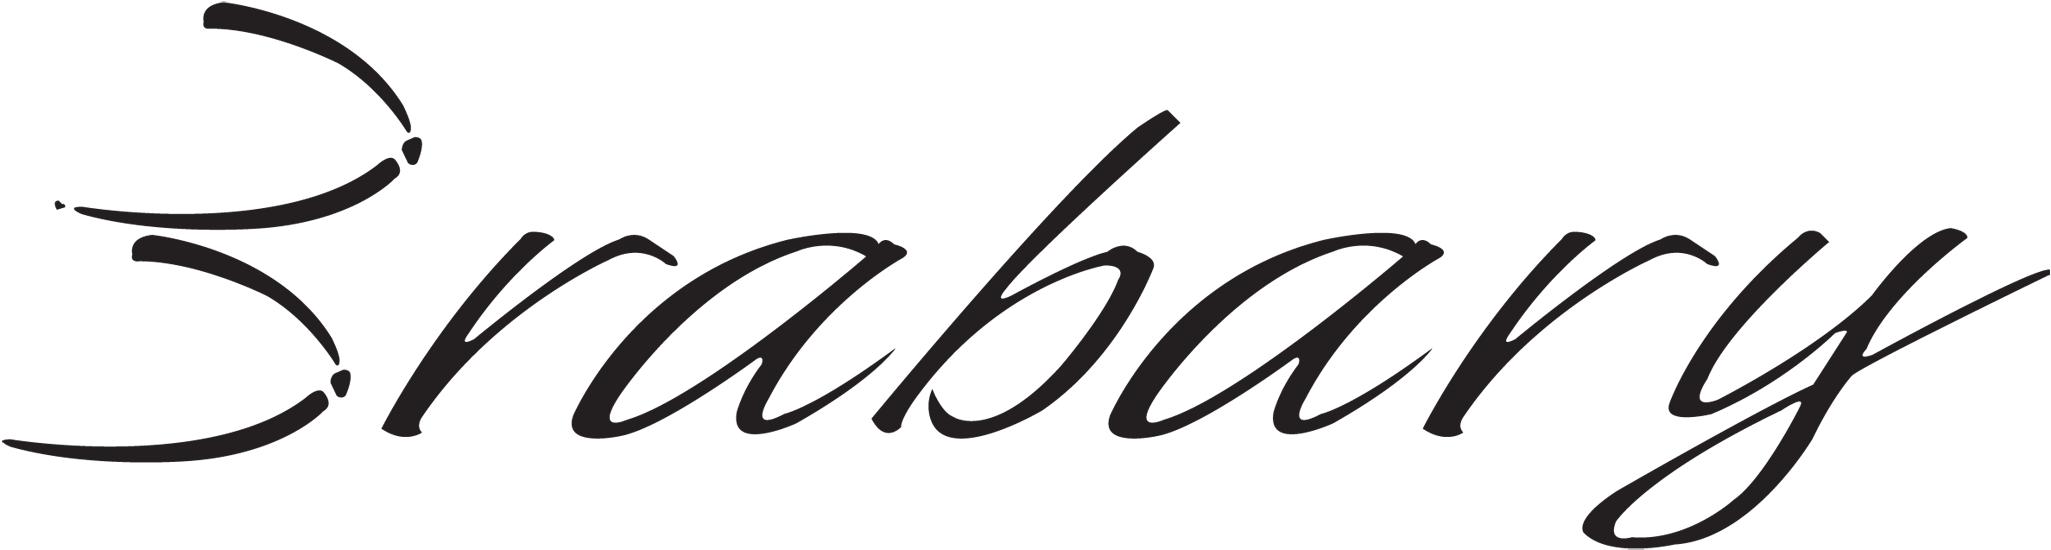 Brabary logo